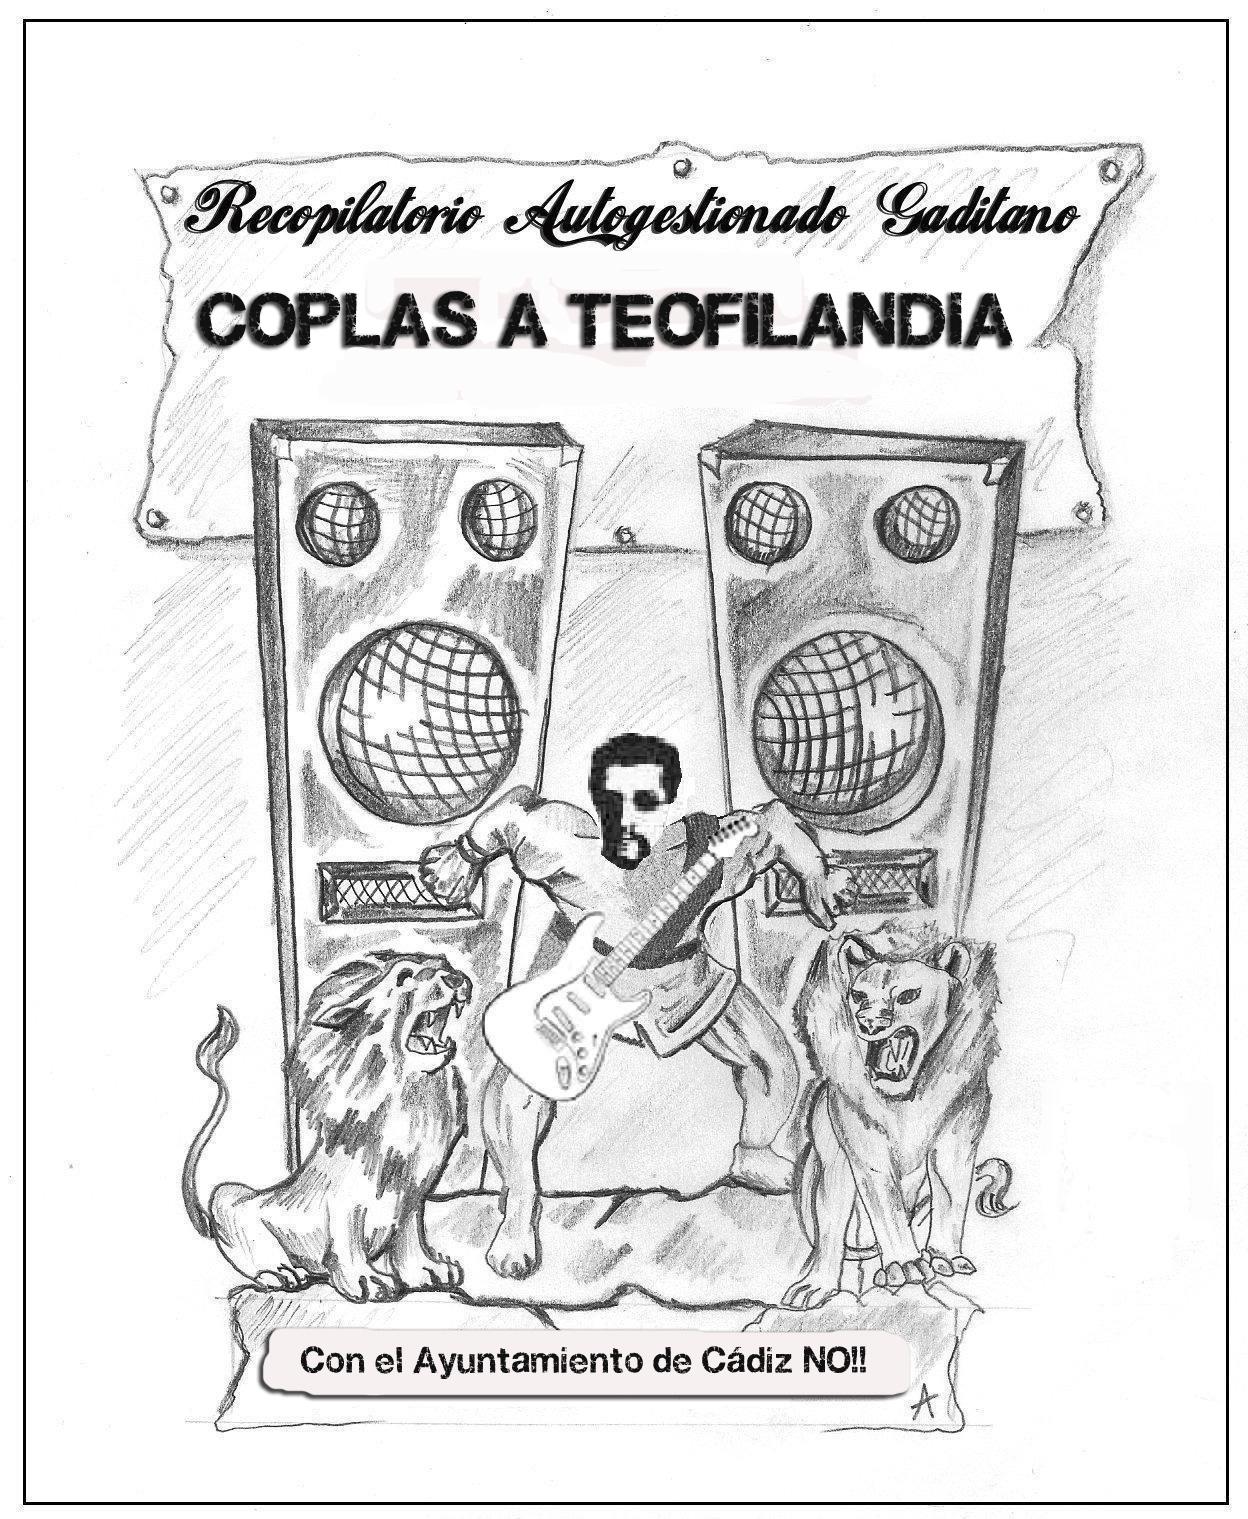 Coplas a Teofilandia